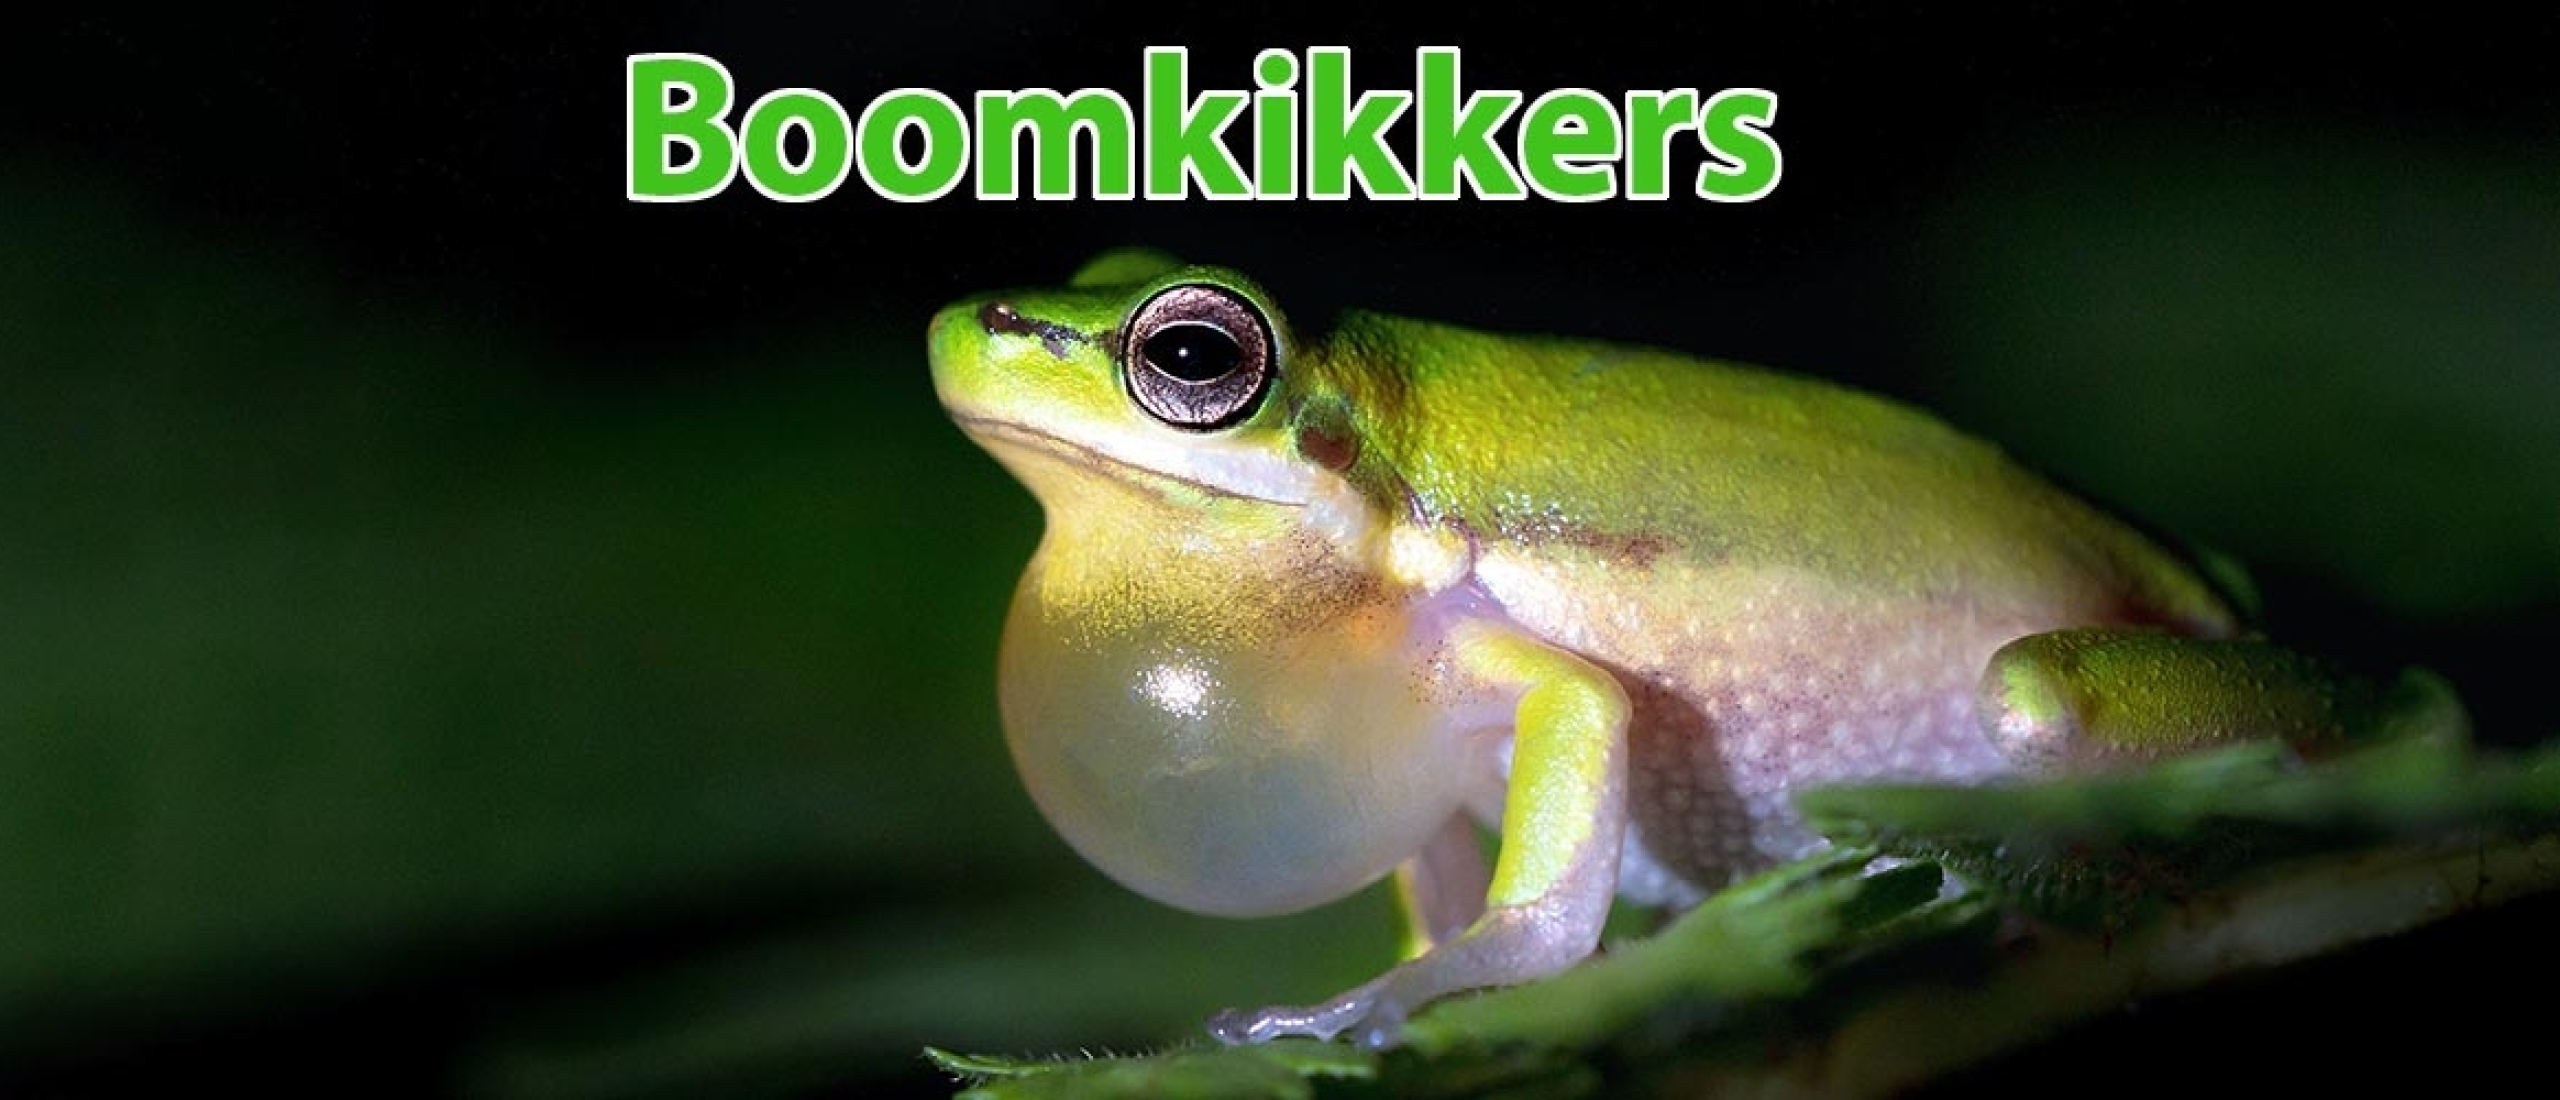 Boomkikkers fotograferen: 35 Tips